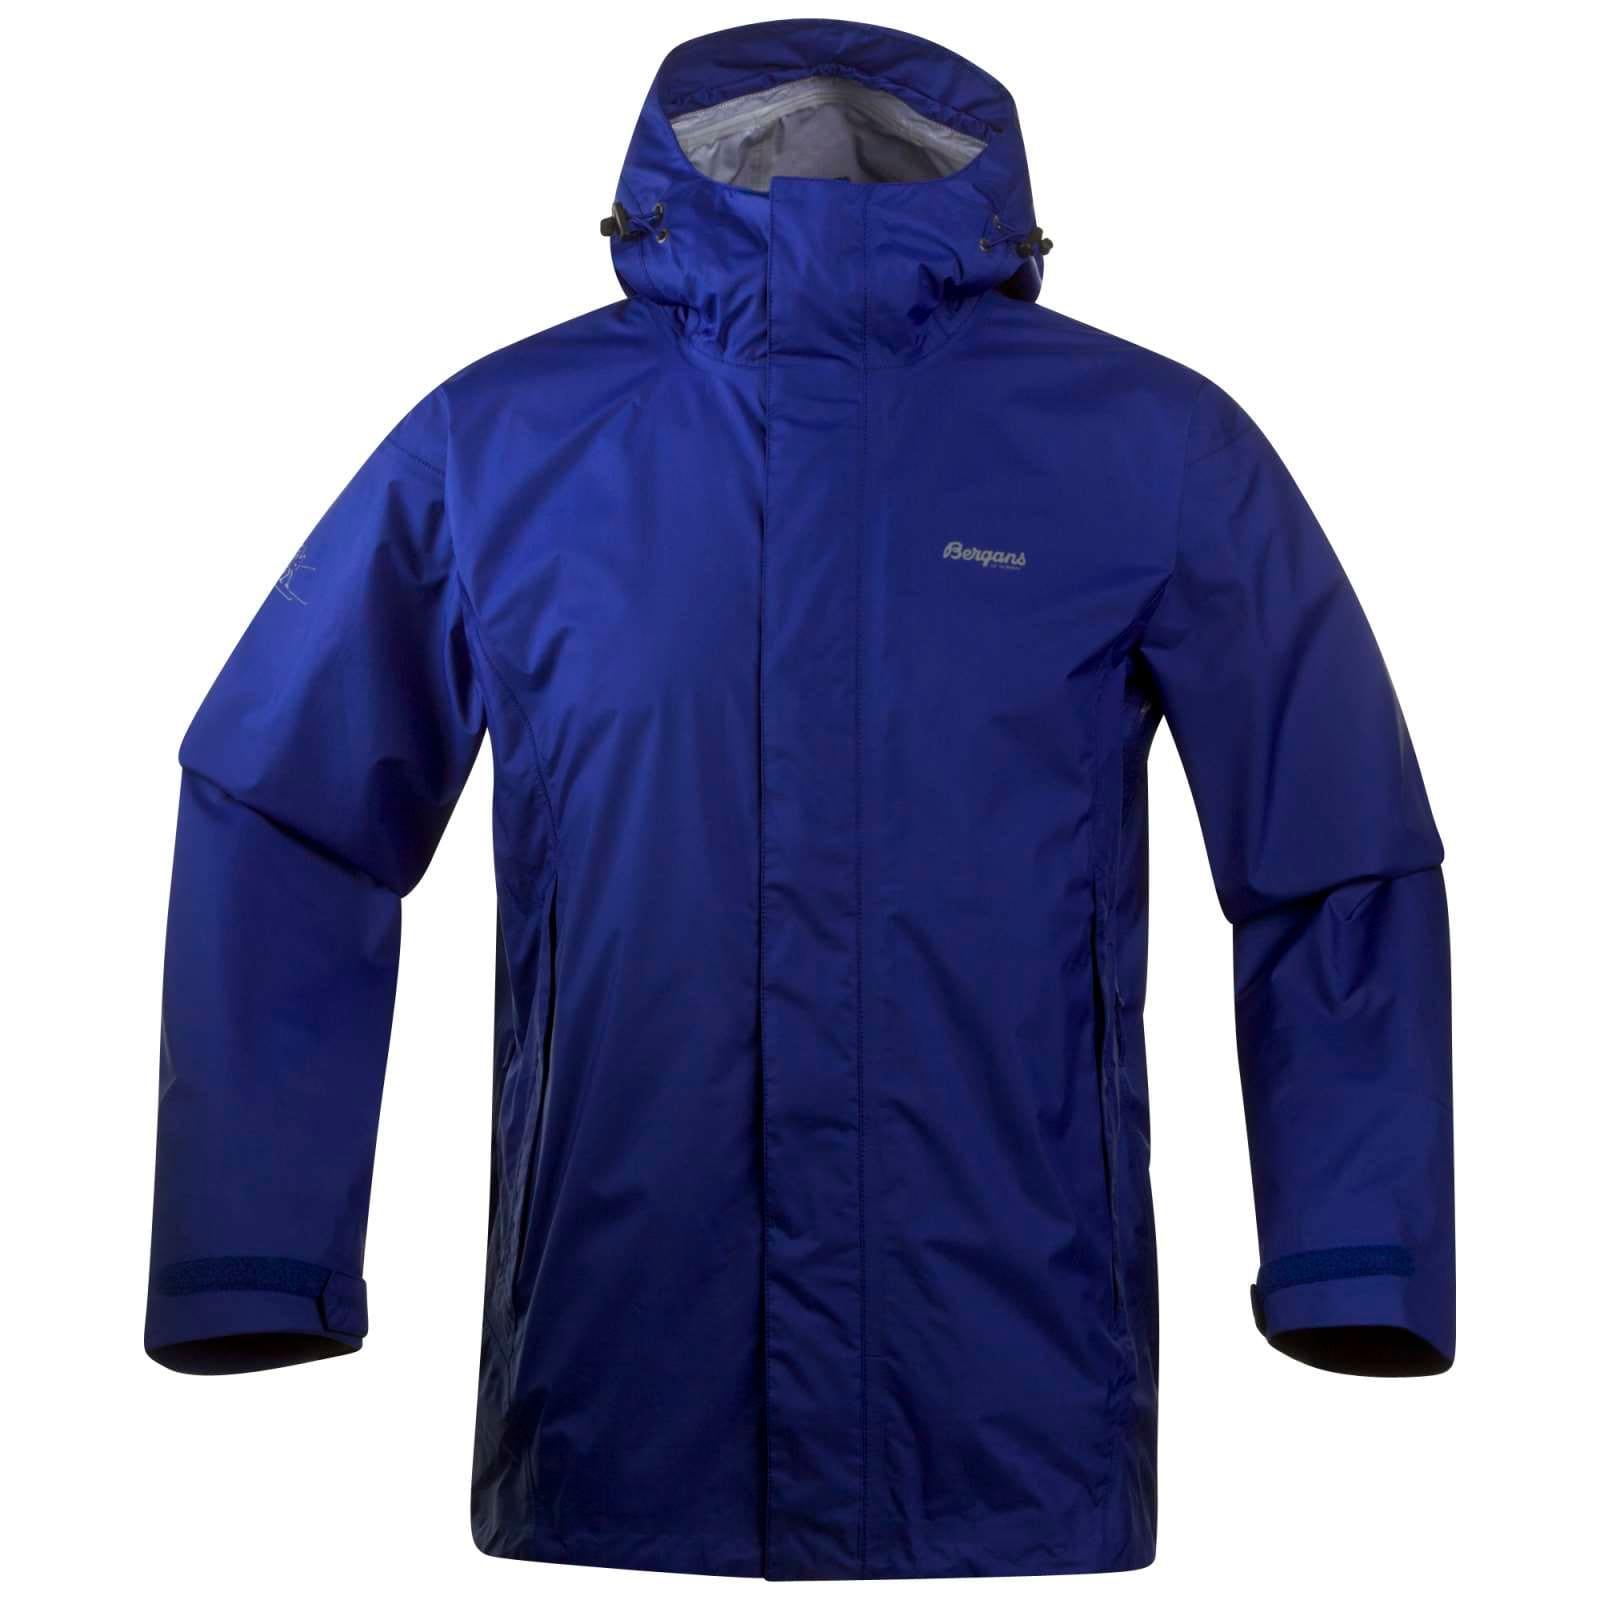 Bergans Women's Super Lett Jacket koop |Bergzeit